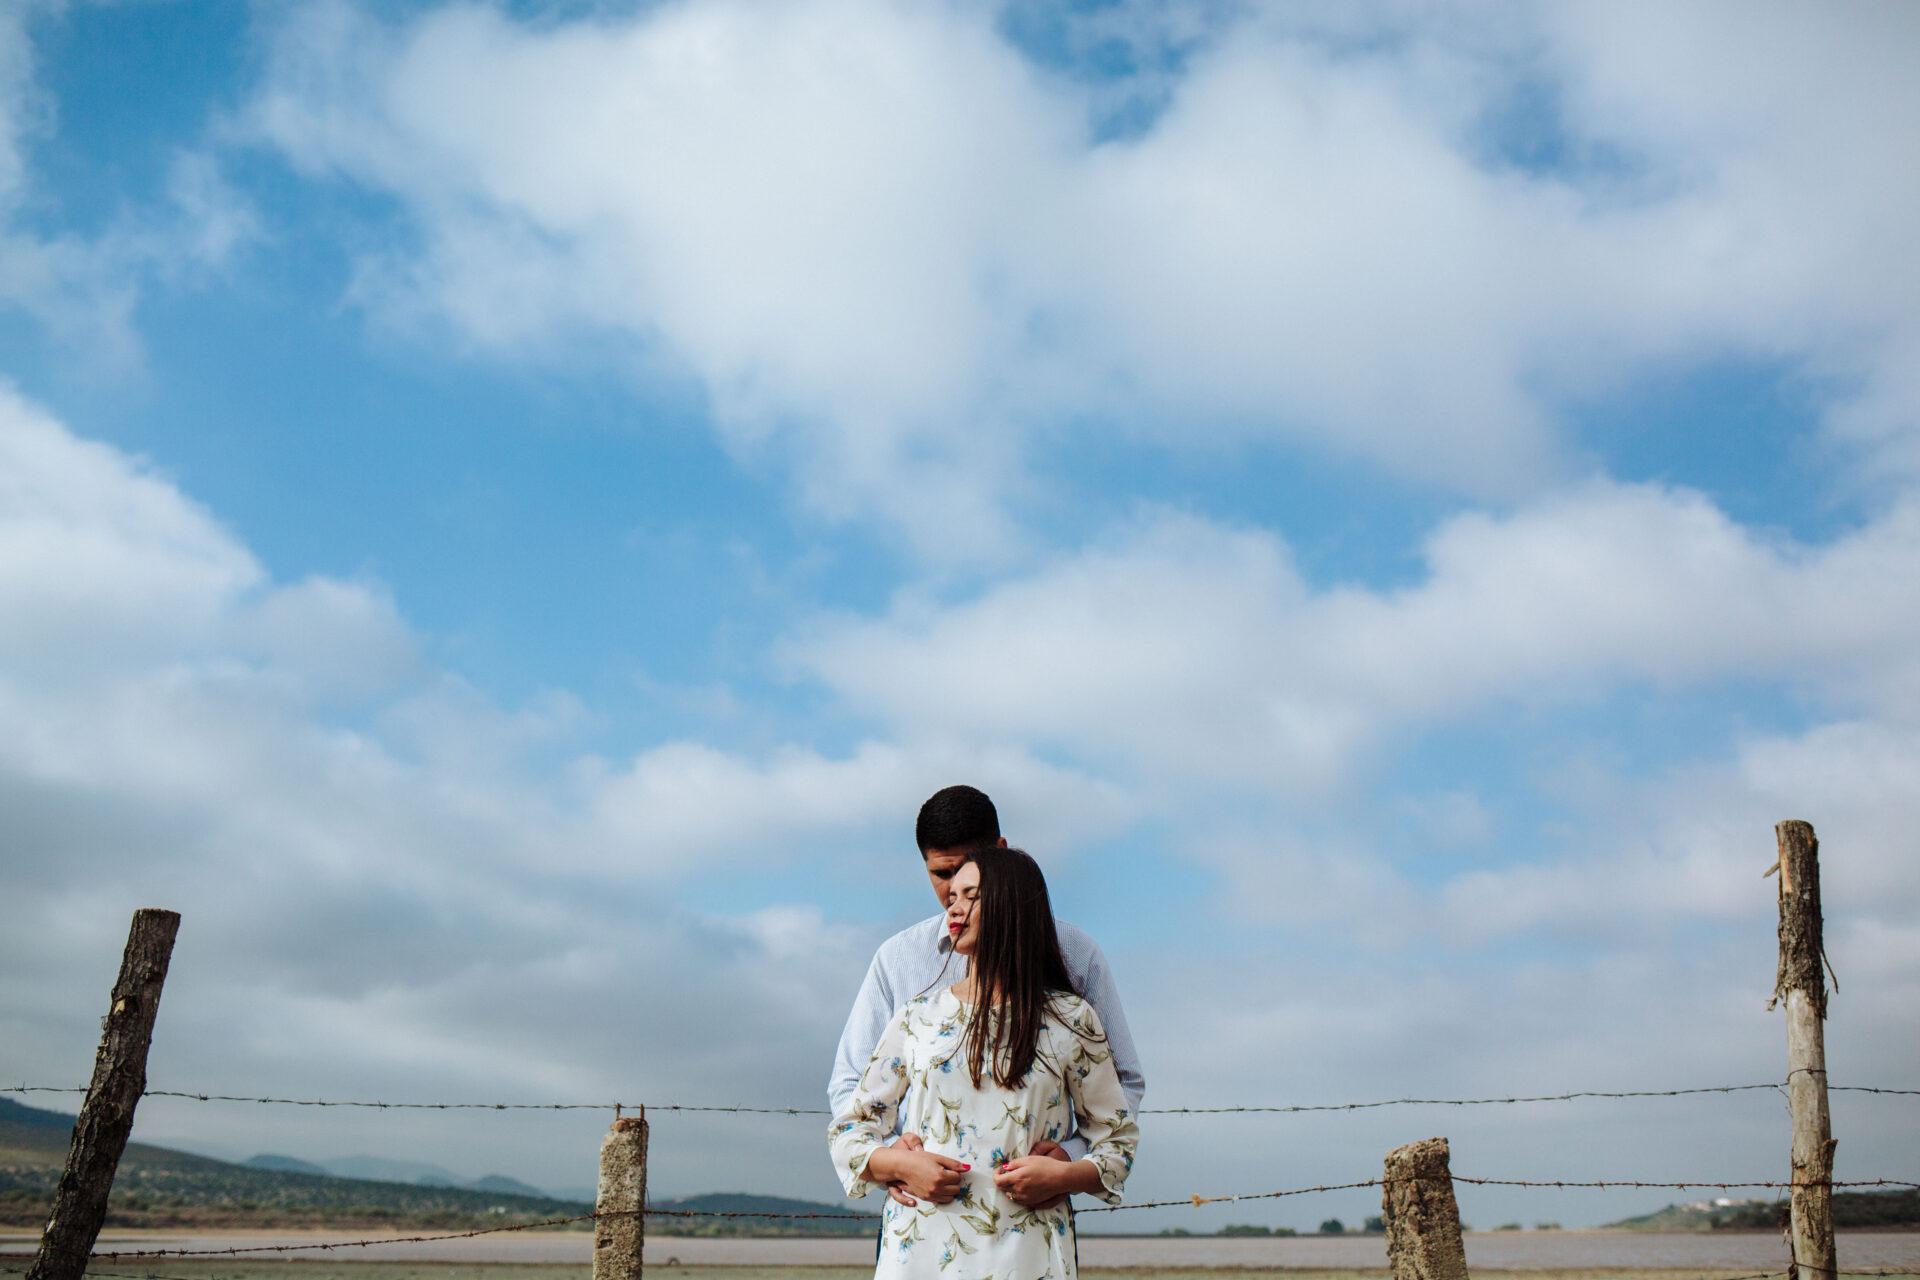 javier_noriega_fotografo_bodas_save_the_date_preboda_zacatecas_wedding_photographer10